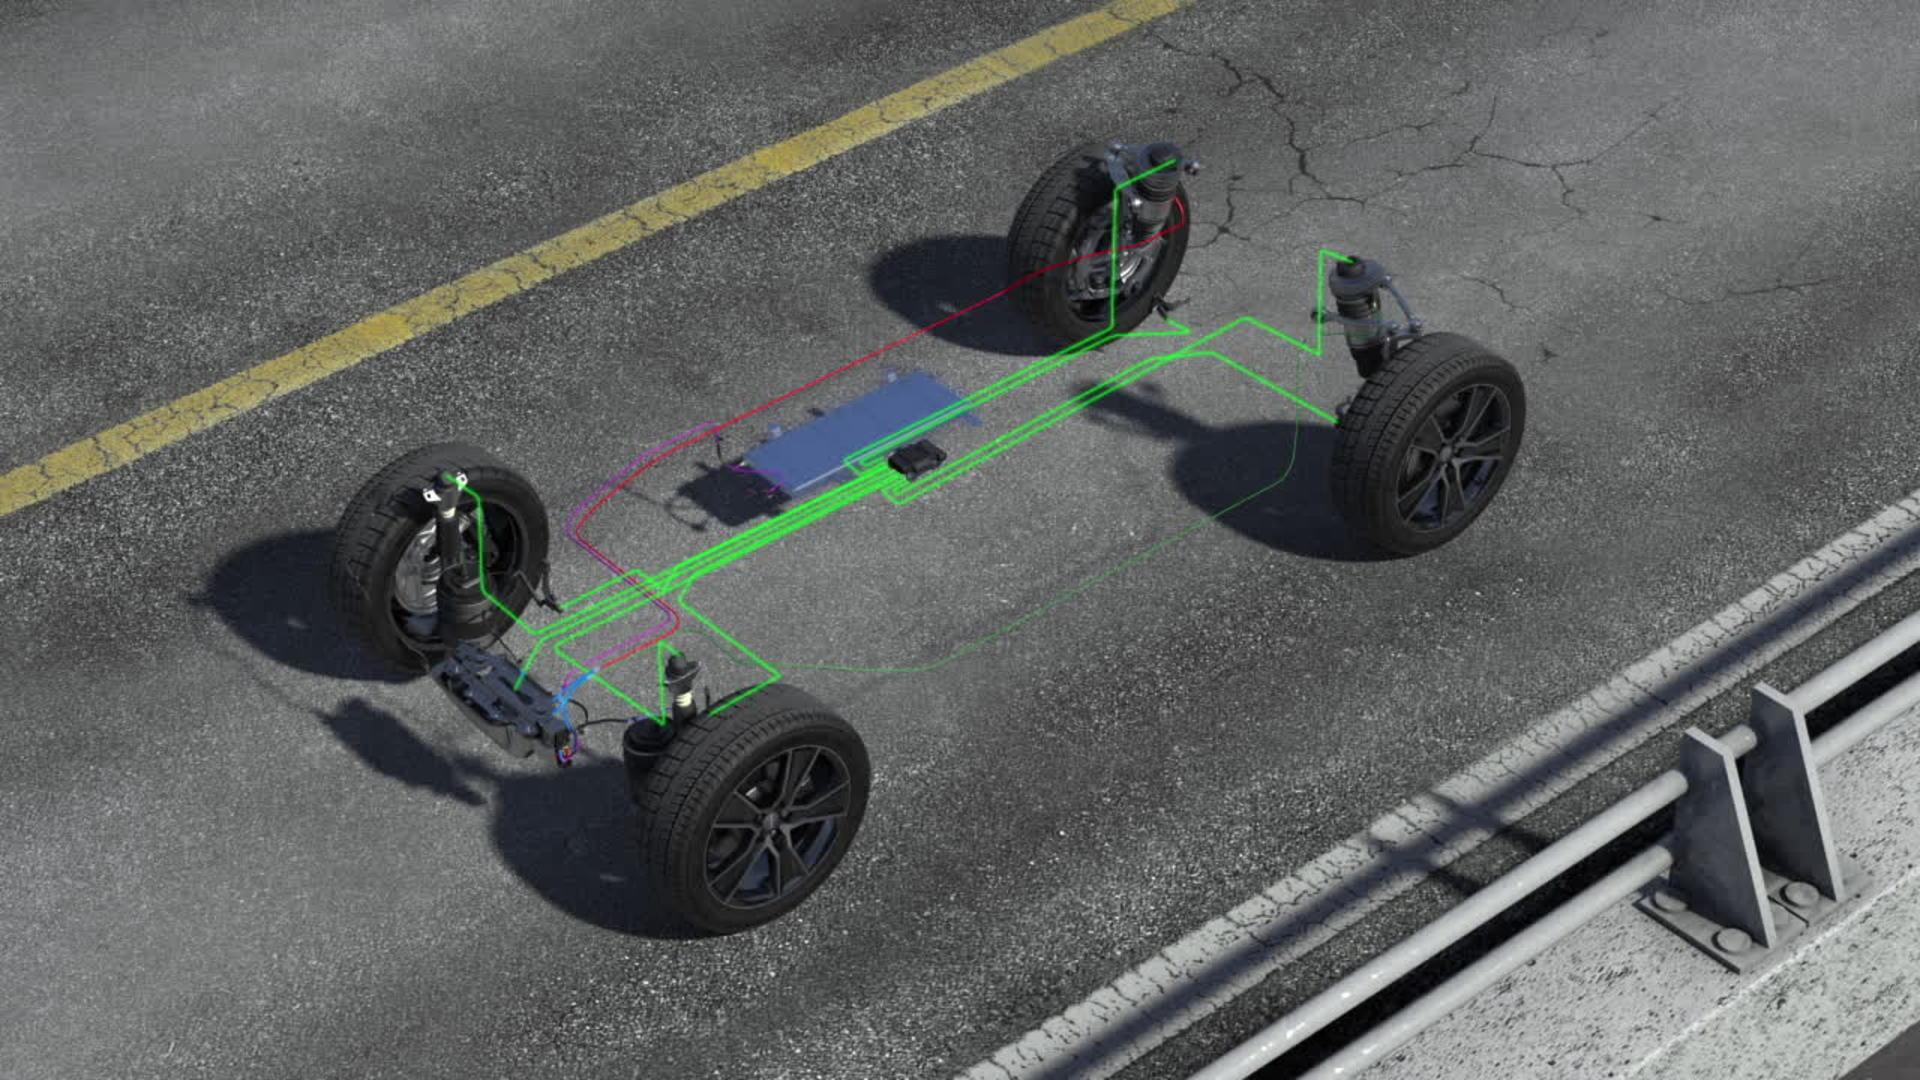 Audi Q5 – Animation air suspension with damper control